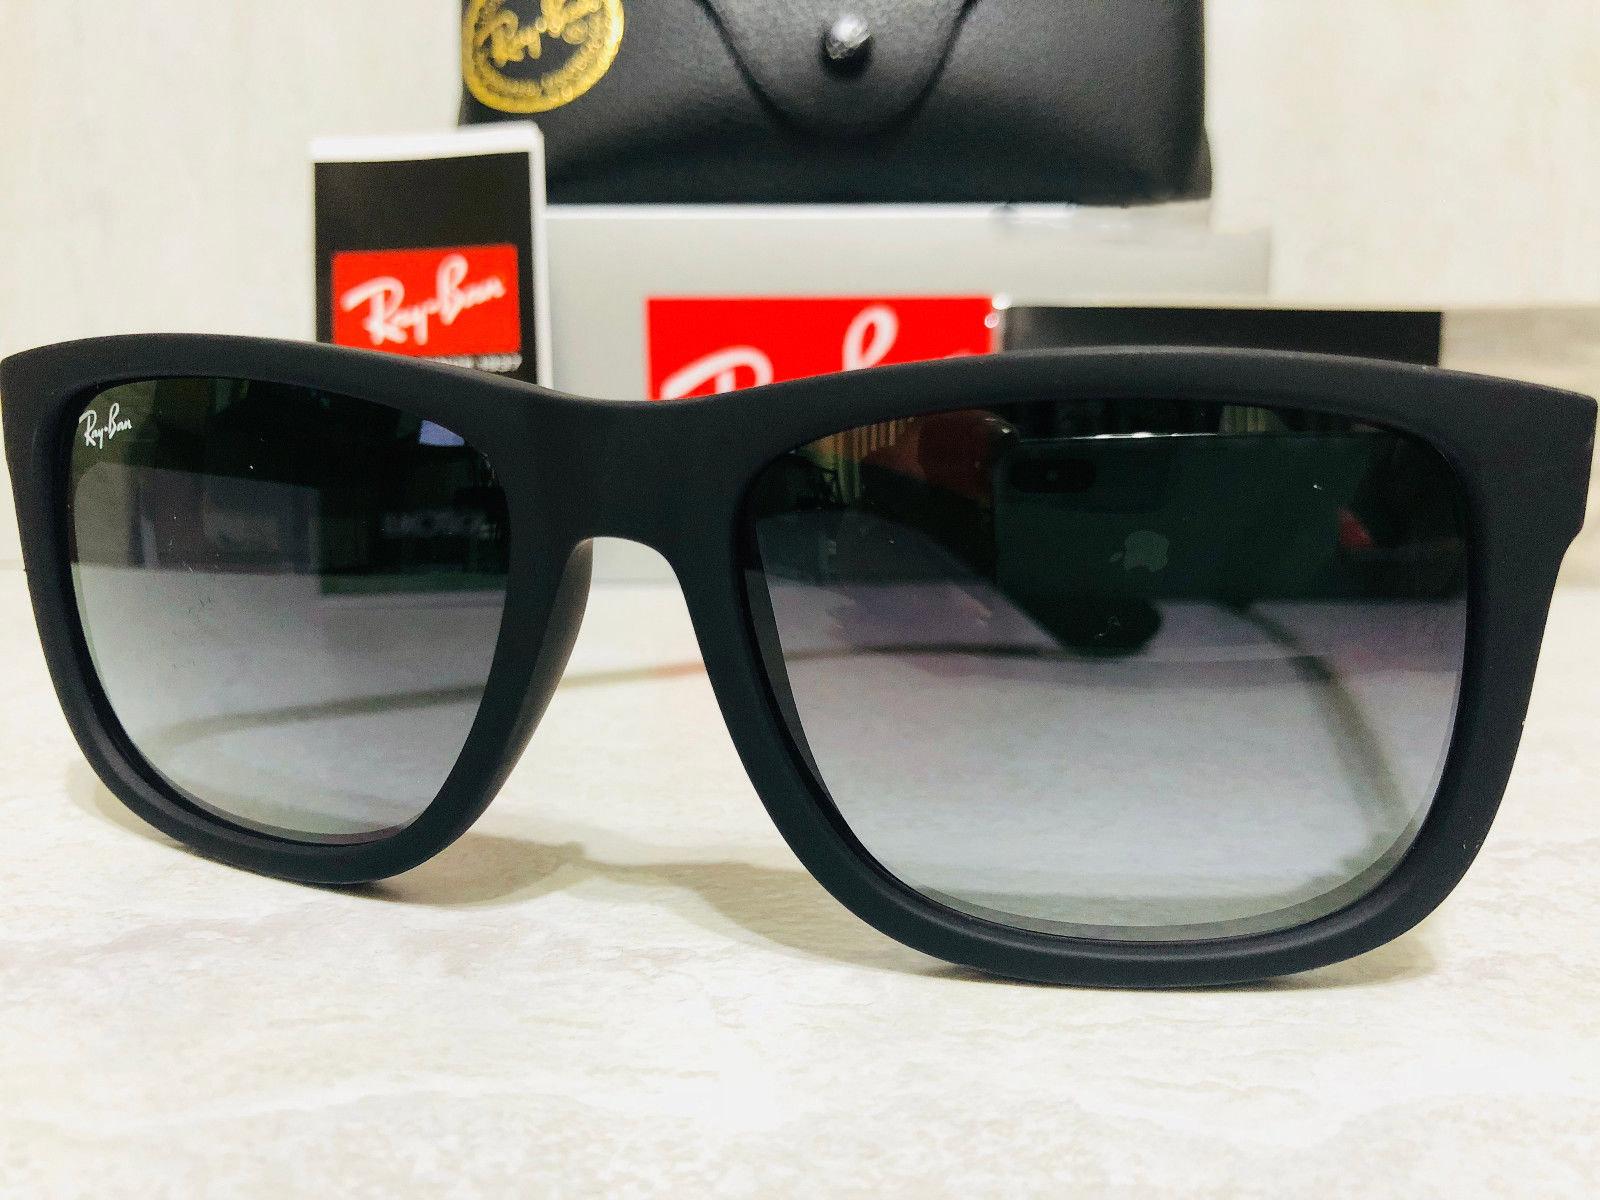 f255cb29f Ray ban men s justin rb4165 6018g 55 black frame grey lens wayfarer  sunglasses 10